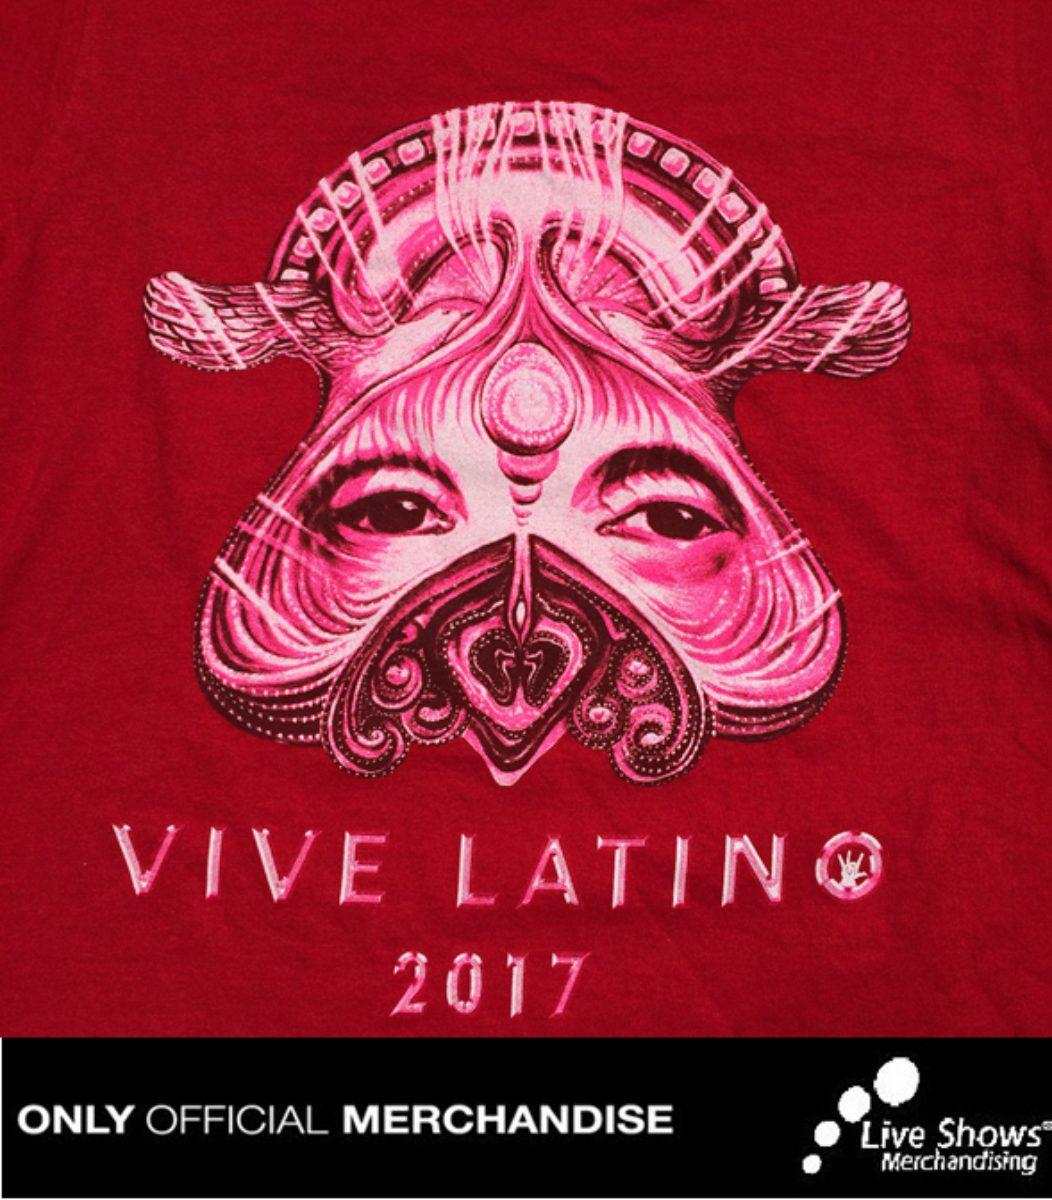 Playera Oficial Vive Latino 2017 para Dama